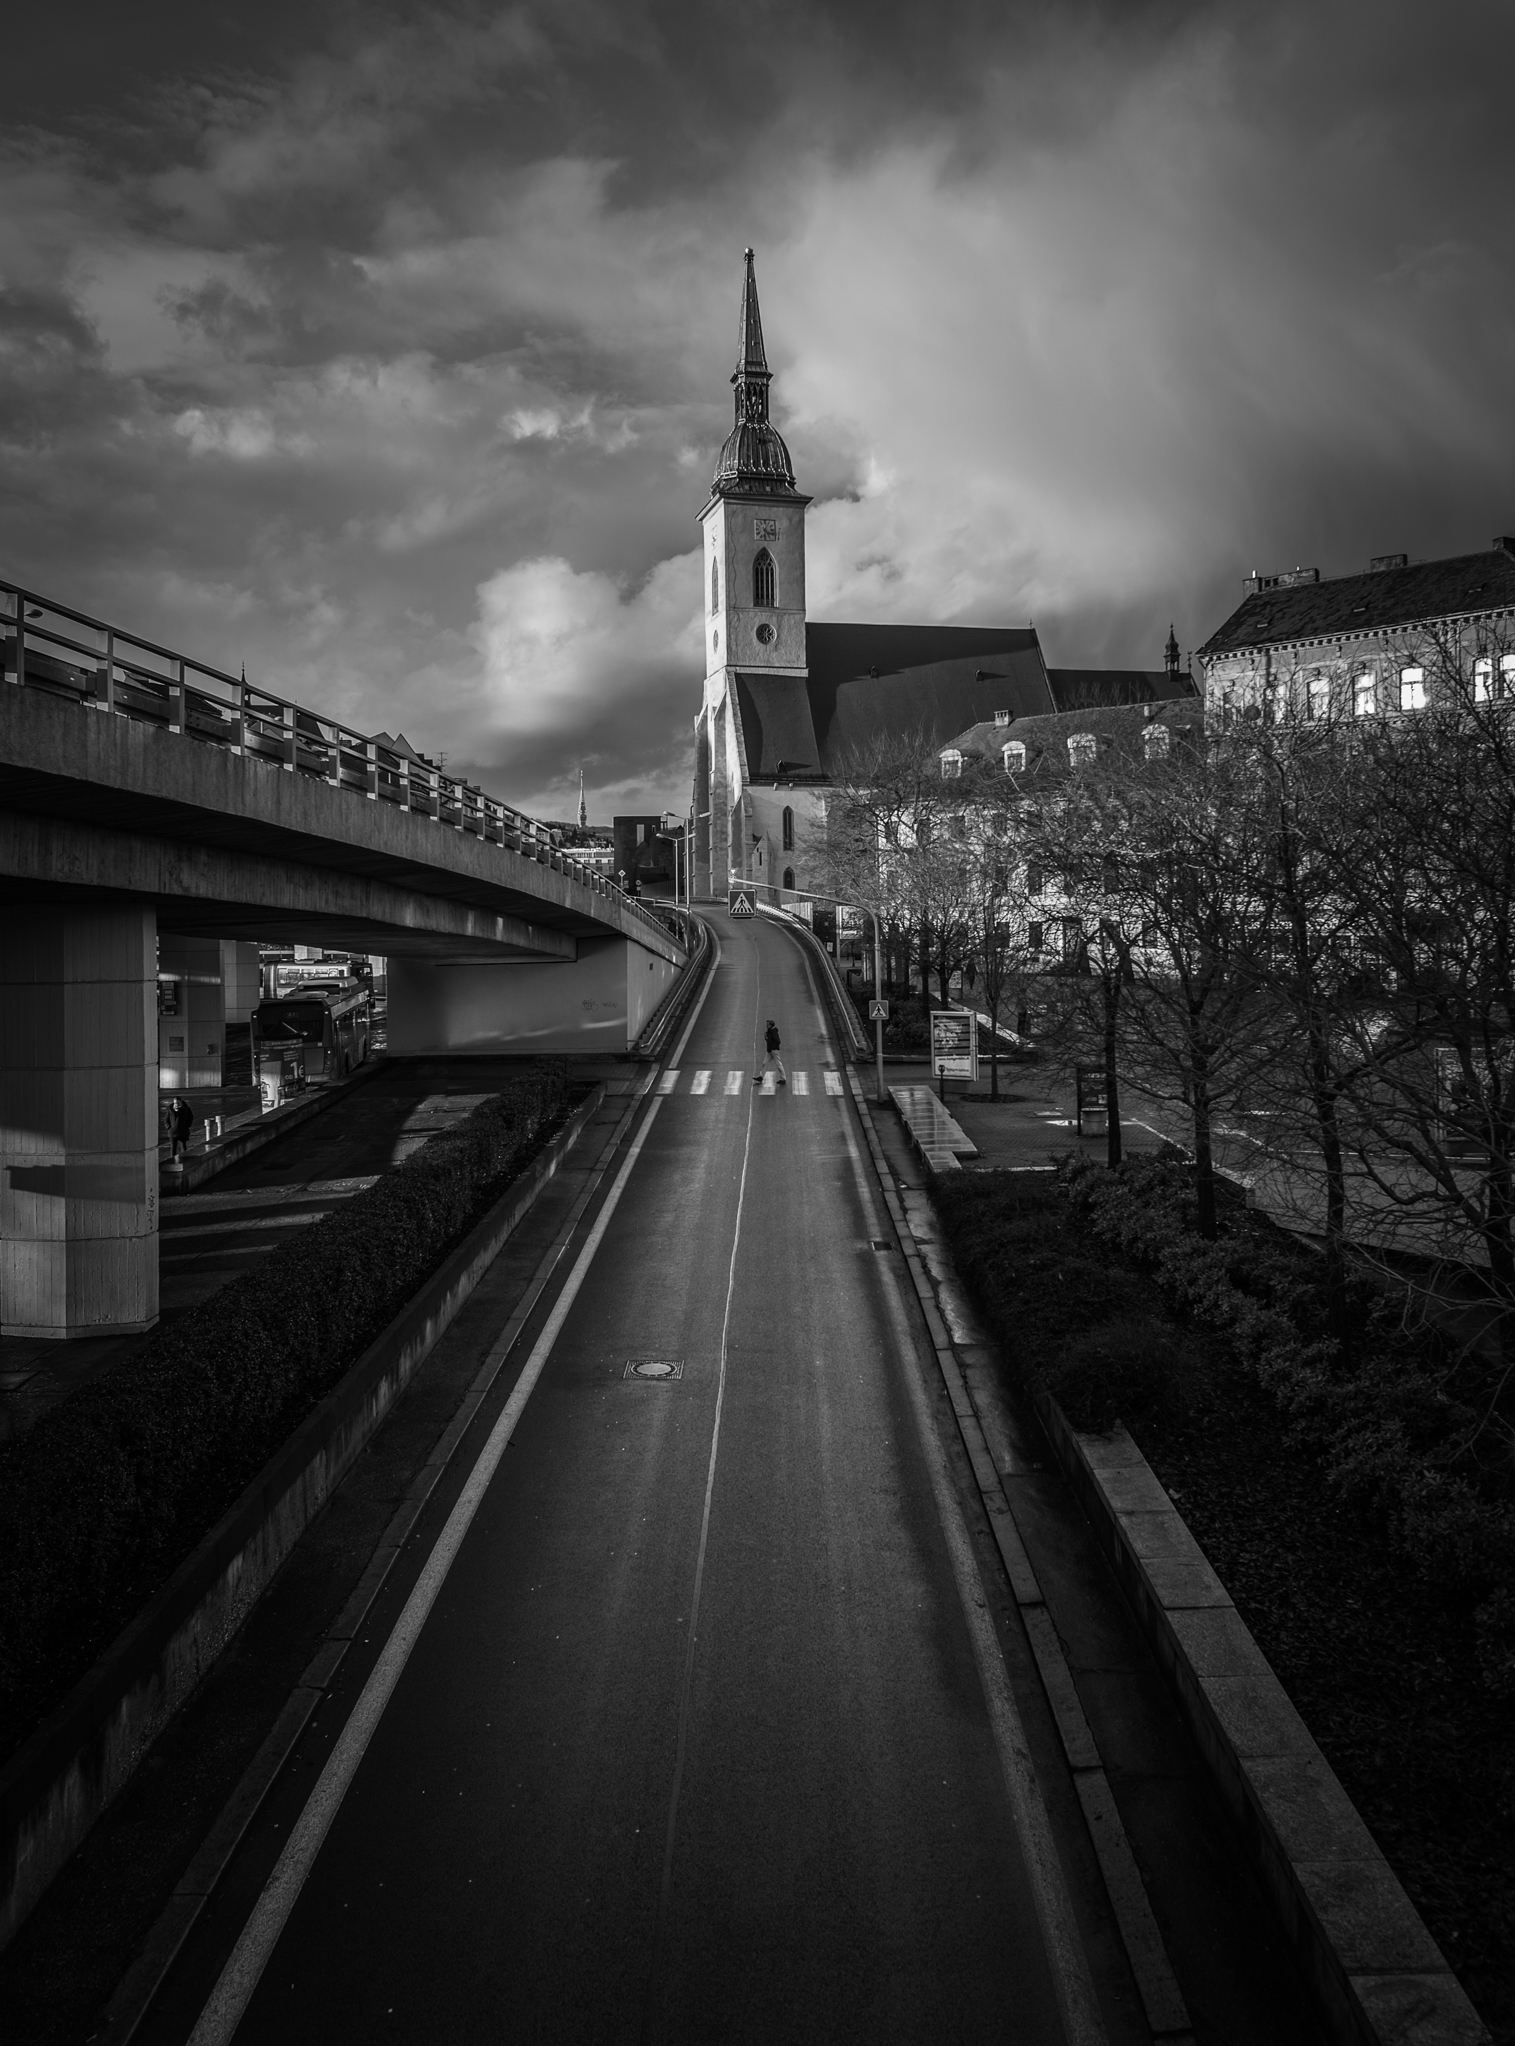 Stormy St. Martins fb.jpg